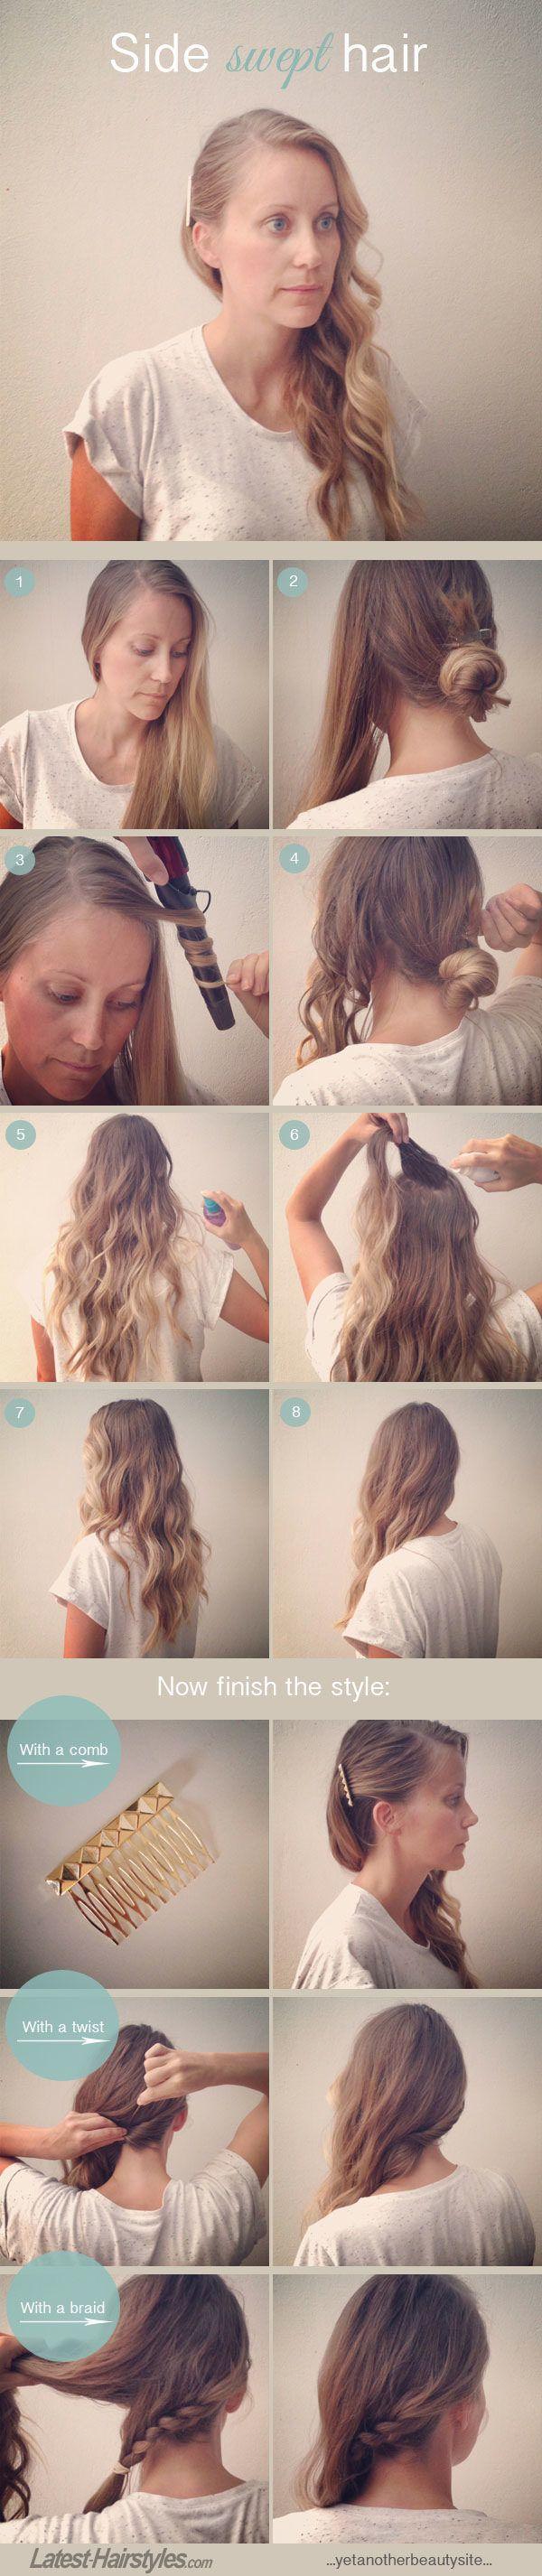 side swept hair tutorial